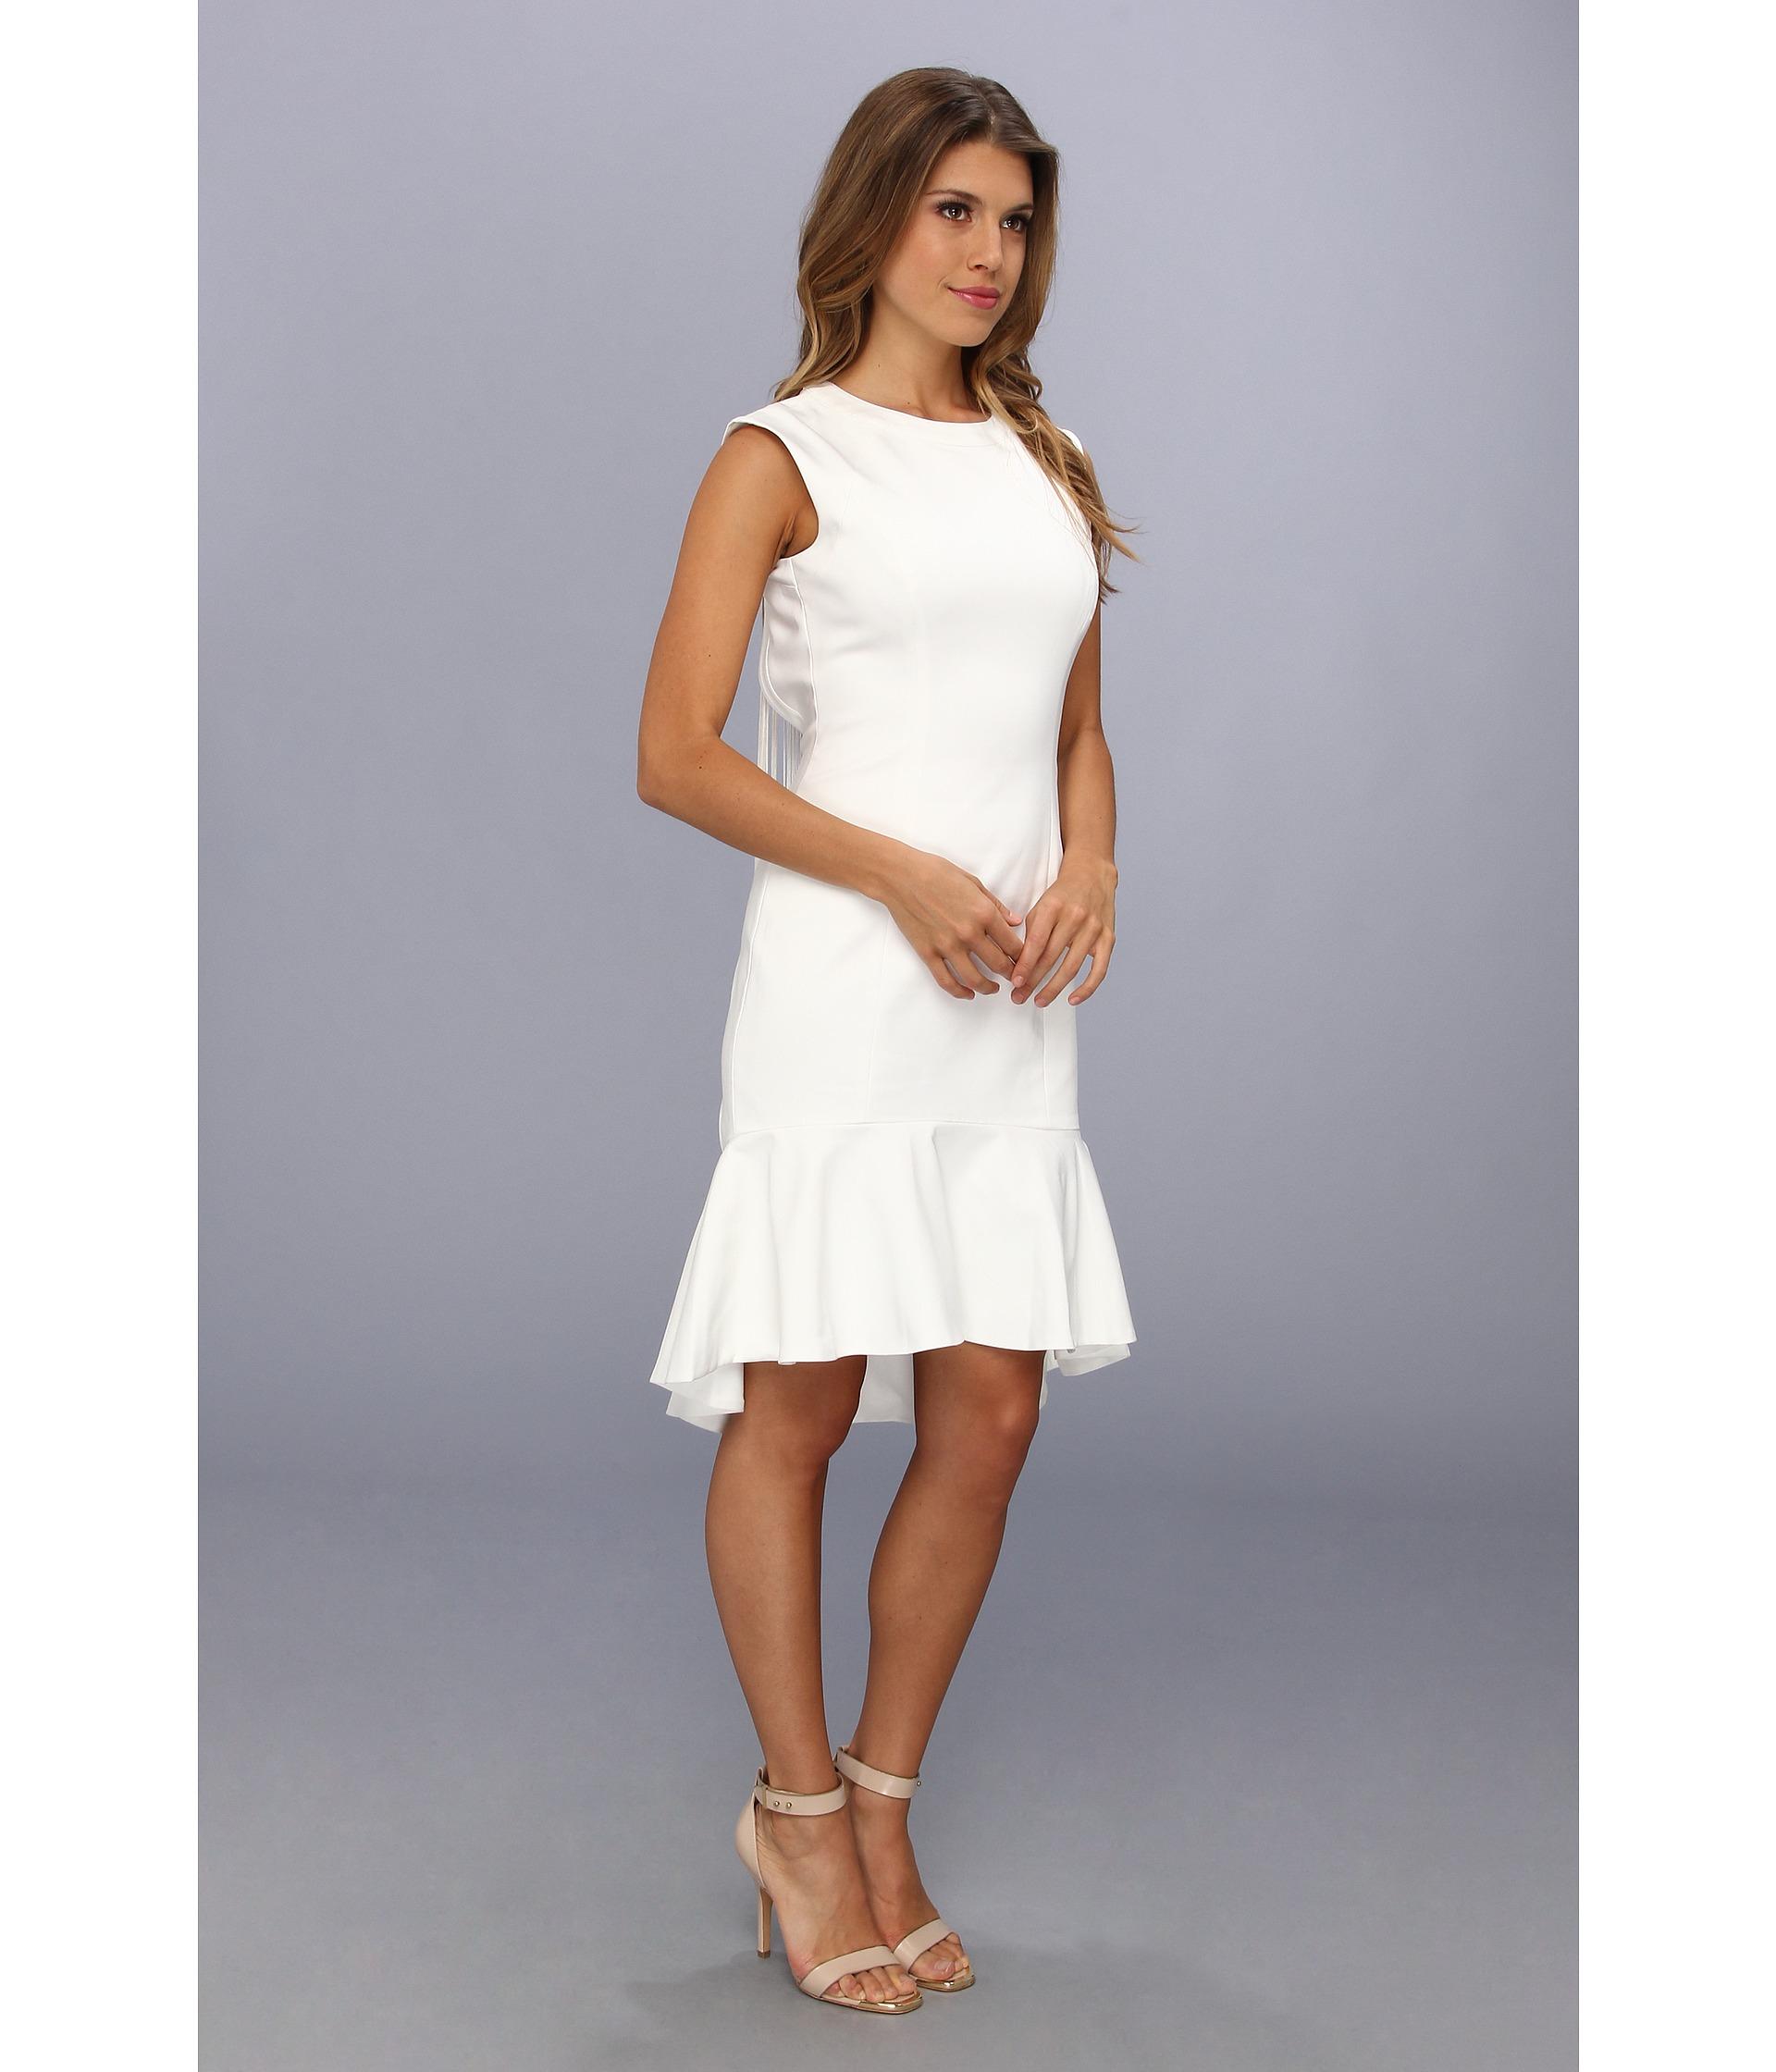 Badgley mischka Open Back Cocktail Dress in White  Lyst